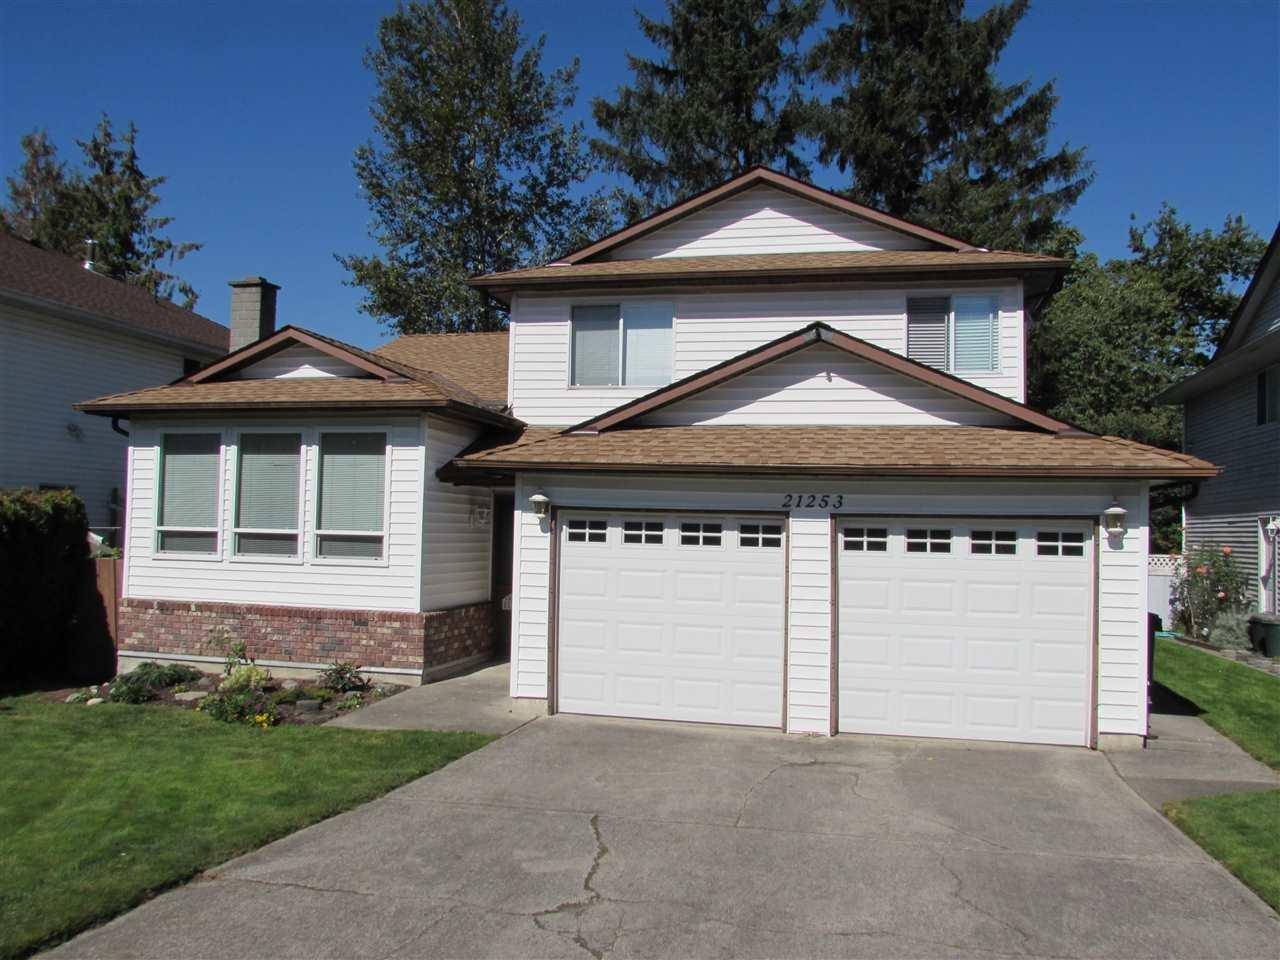 R2108523 - 21253 95A AVENUE, Walnut Grove, Langley, BC - House/Single Family